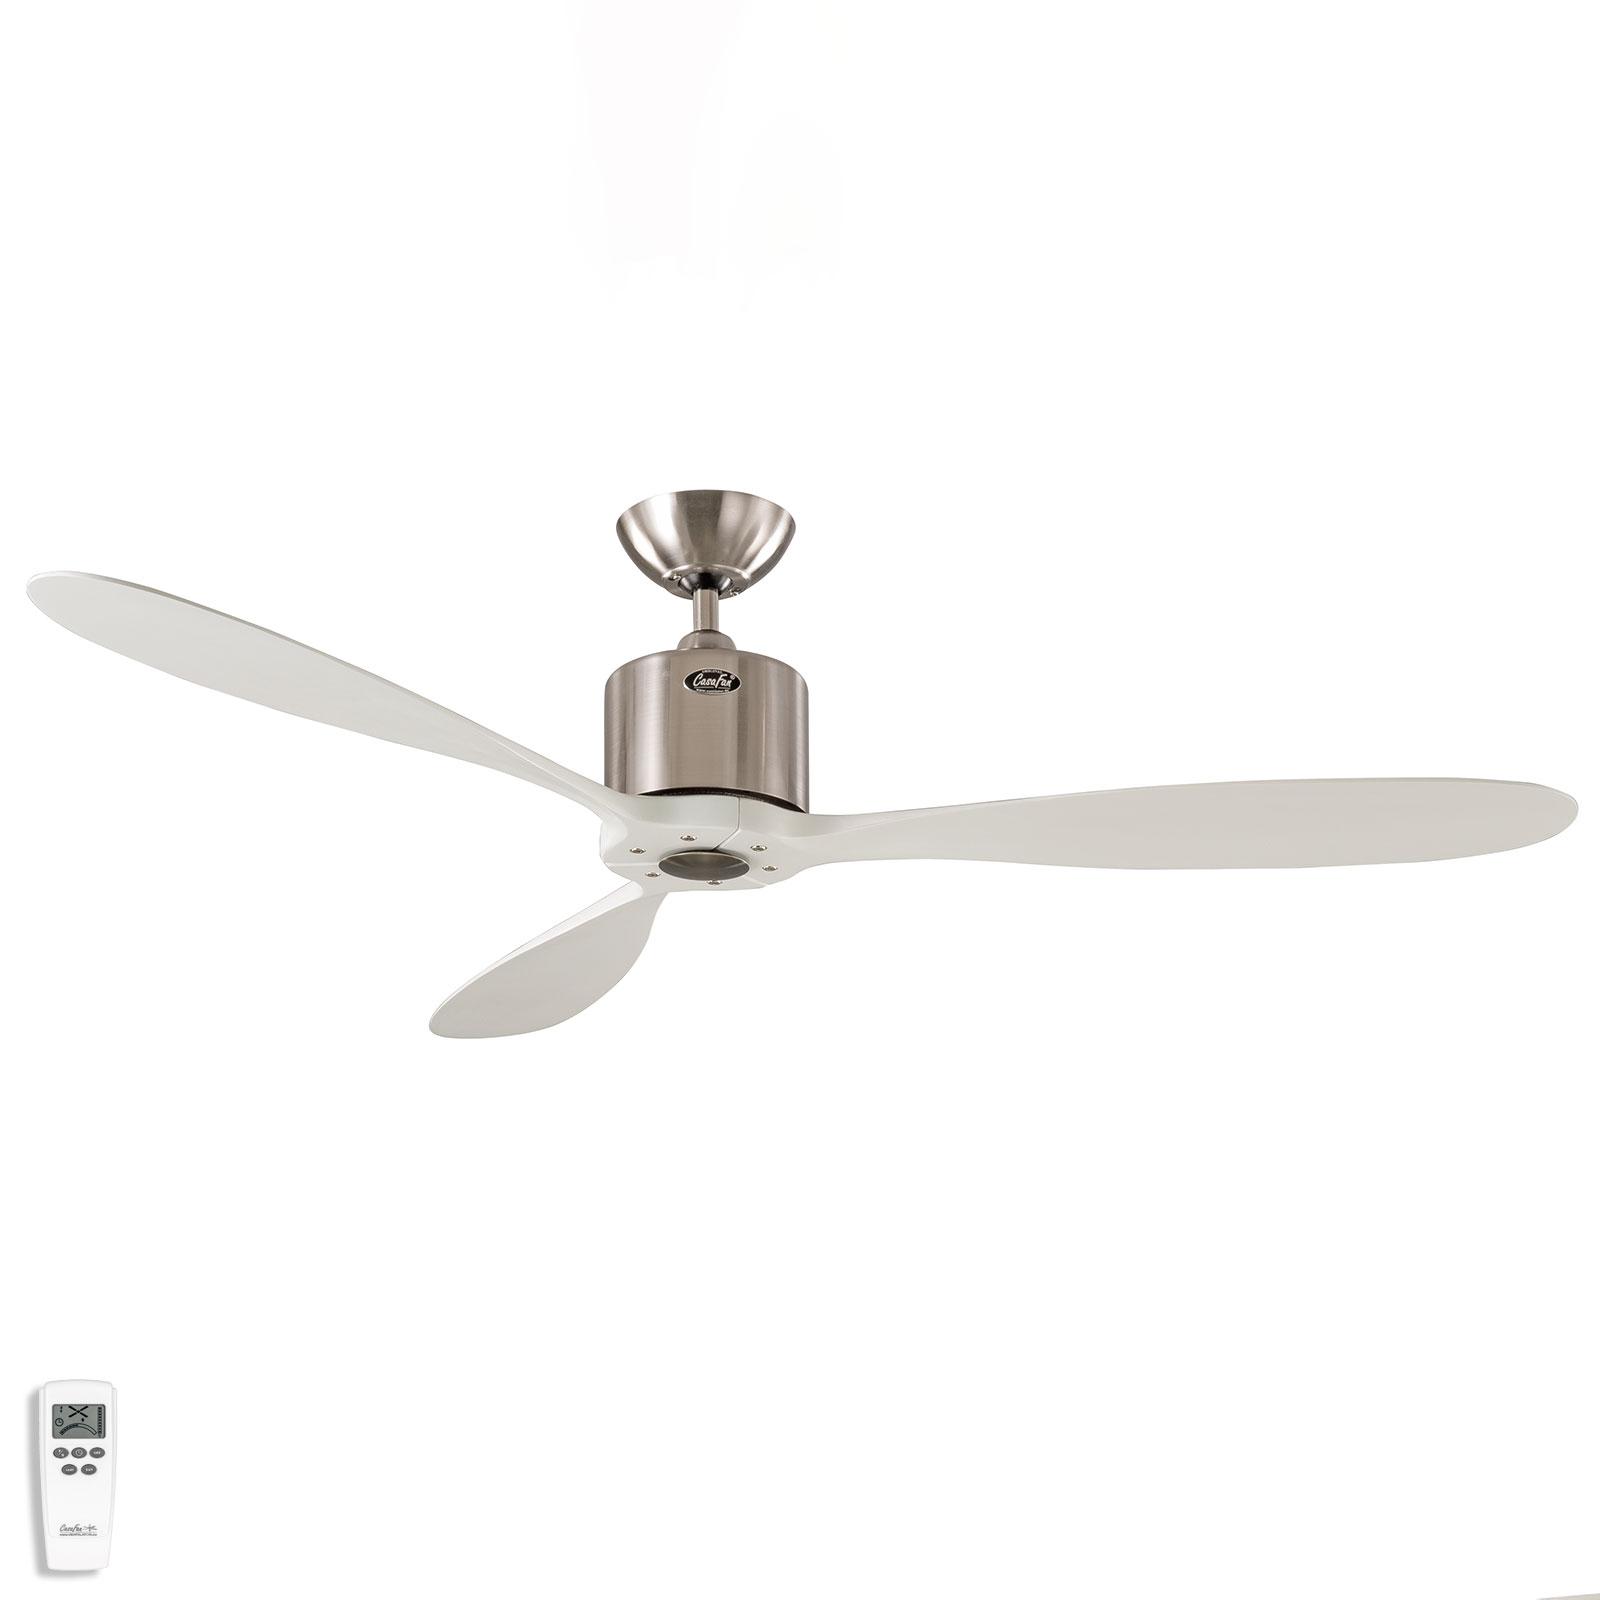 Takvifte Aeroplan Eco, krom, hvit